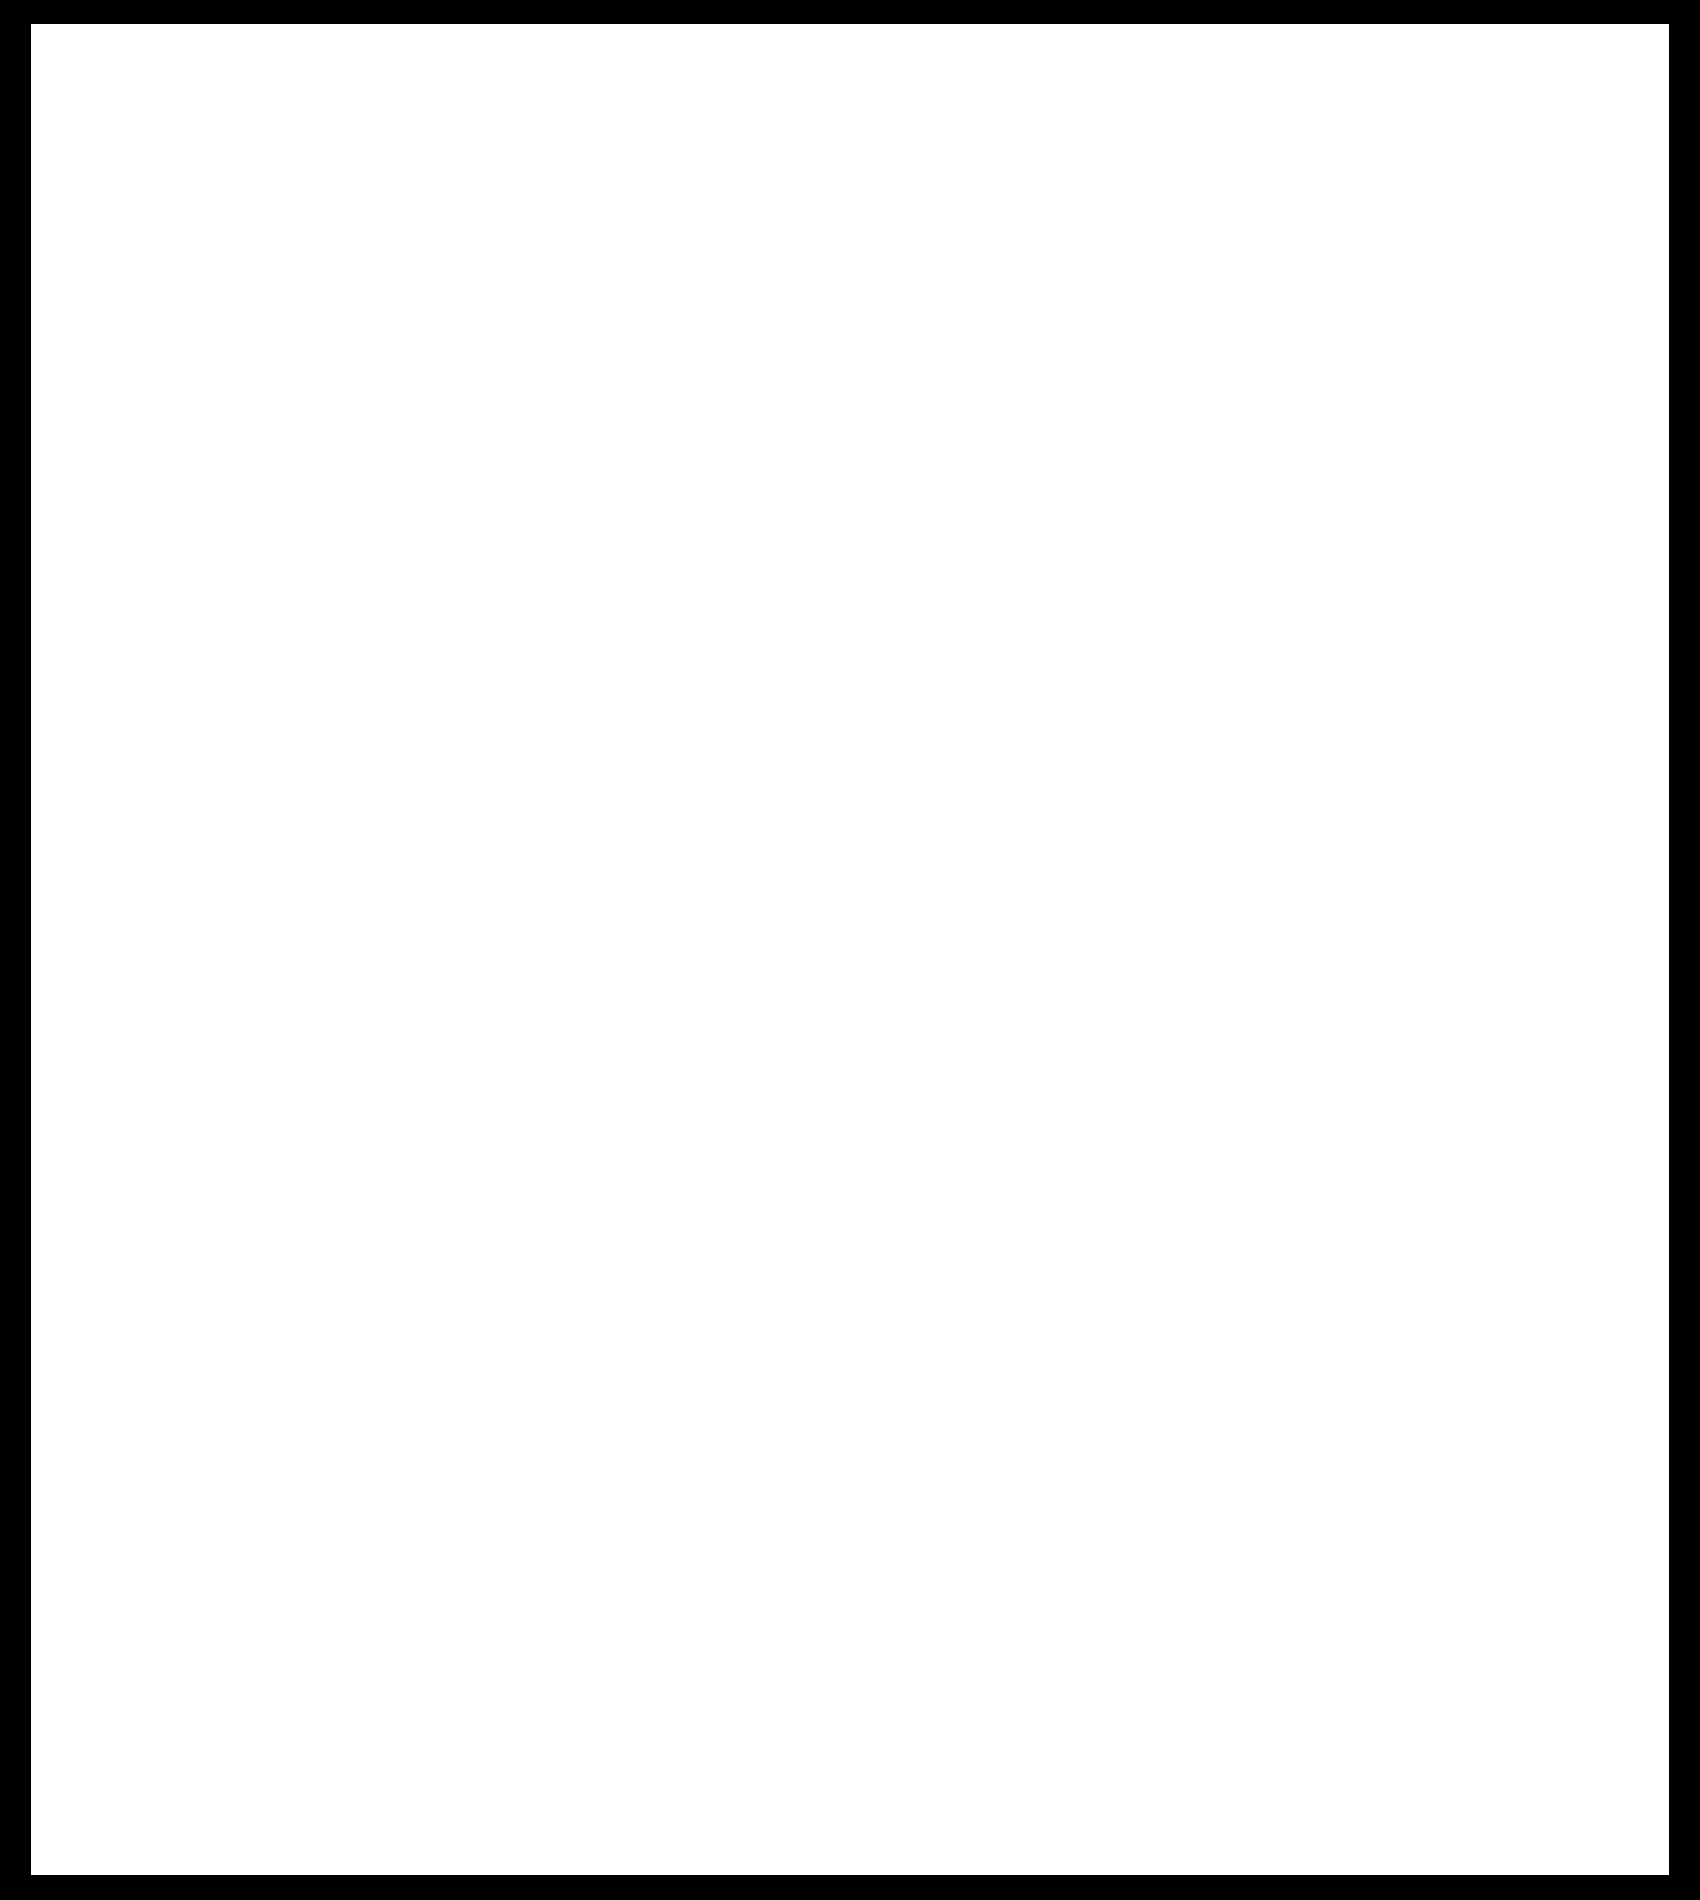 Free Black Outline Png, Download Free Clip Art, Free Clip Art on.